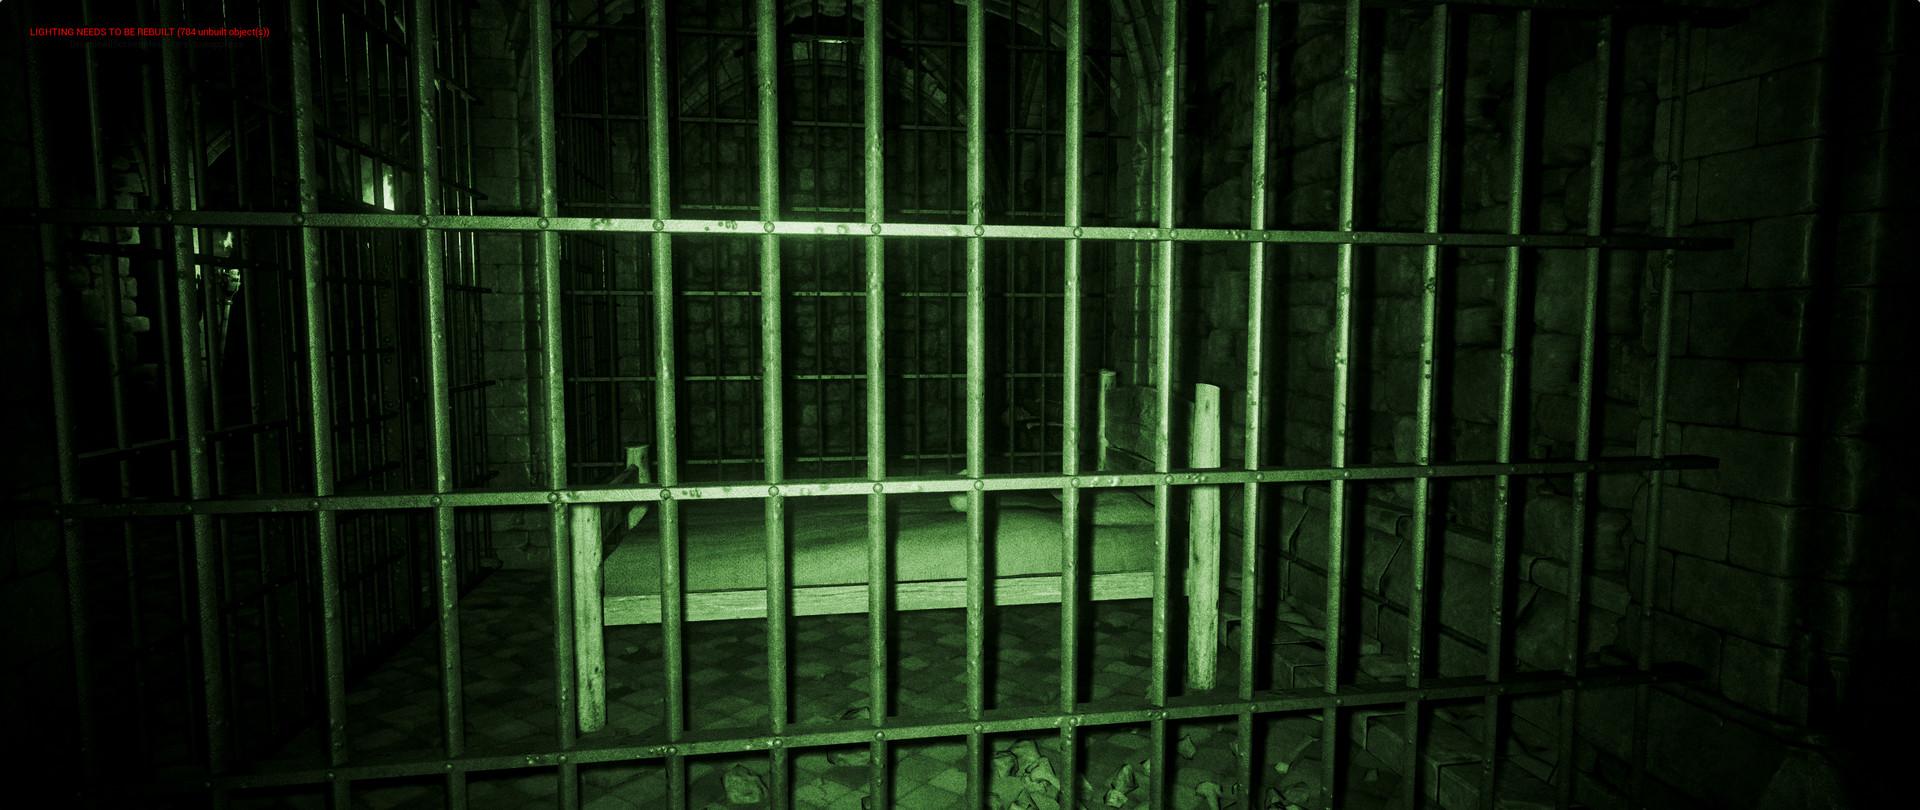 ArtStation - UE4 Night Vision Medieval Prison, Luciano Jacomeli